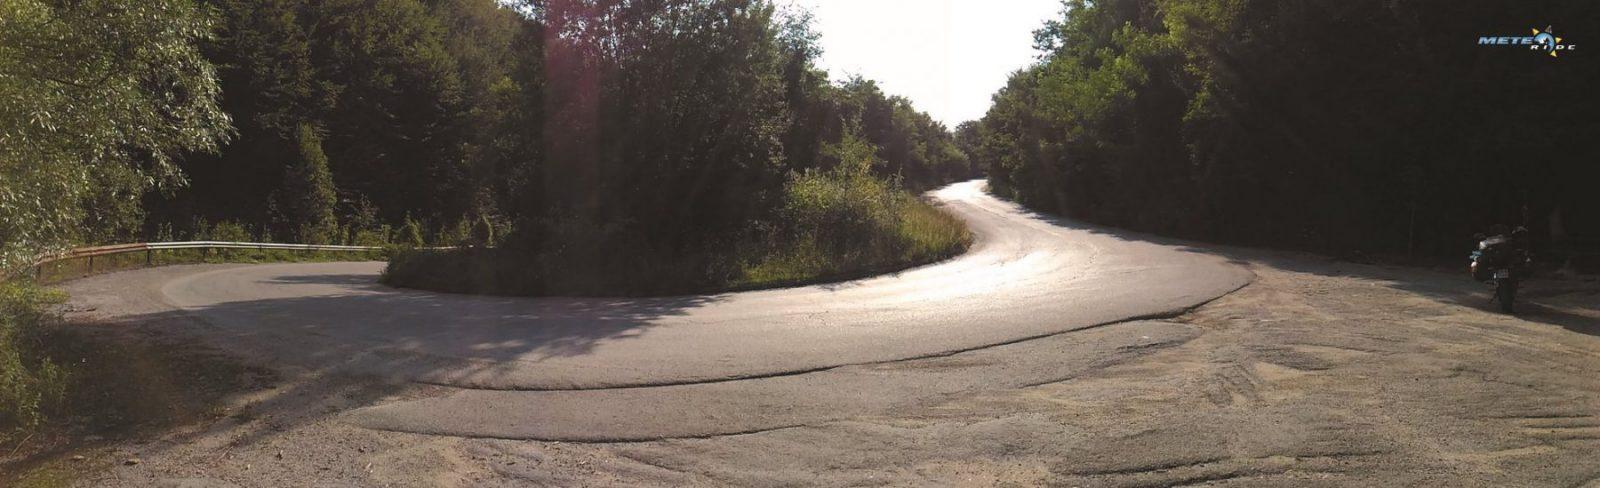 Проходът Богое (Bogoe Pass) Шипковски проход